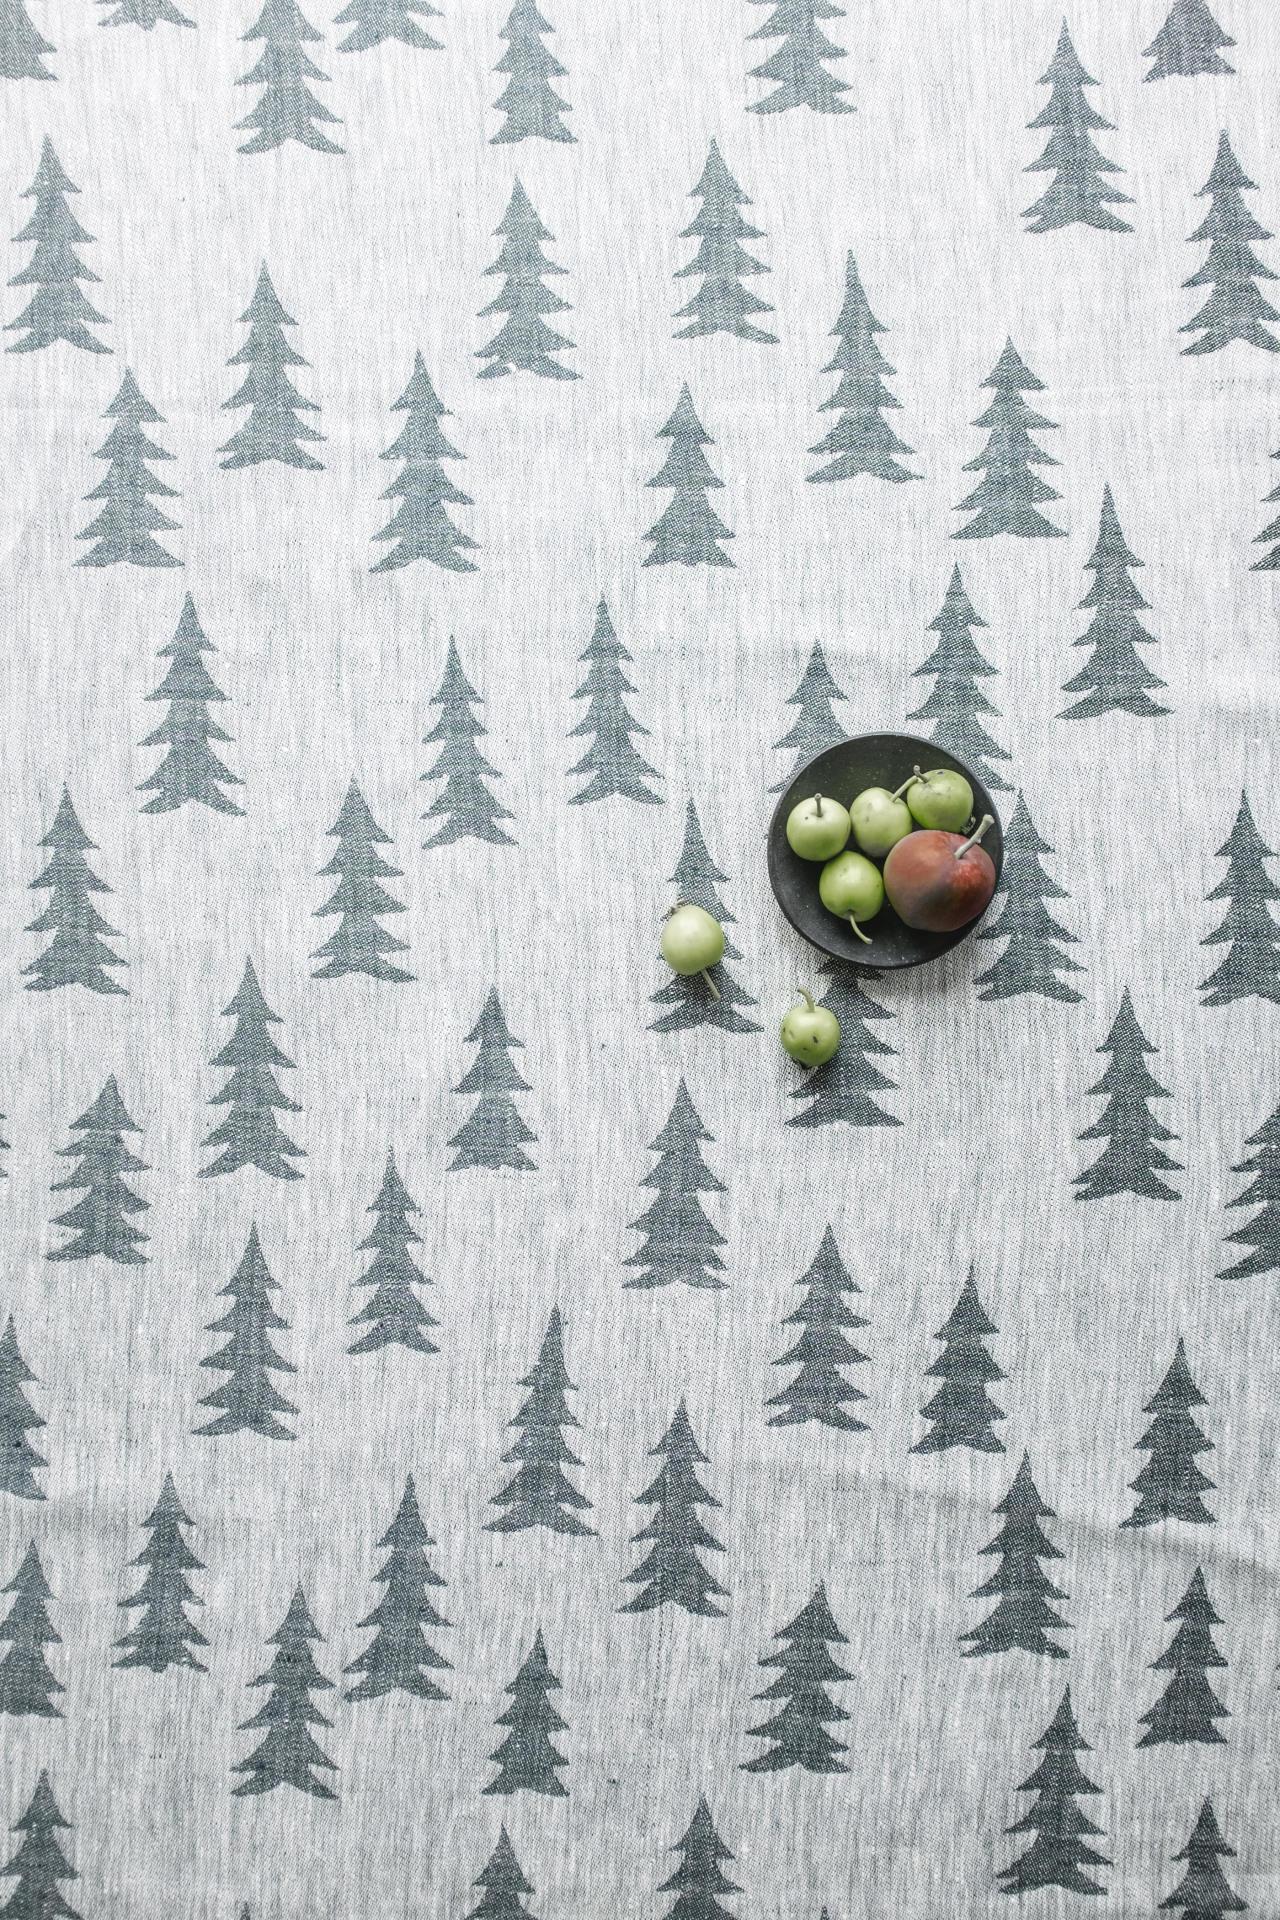 Fine Little Day Lněný ubrus Gran Dark green 147x147 cm, zelená barva, textil